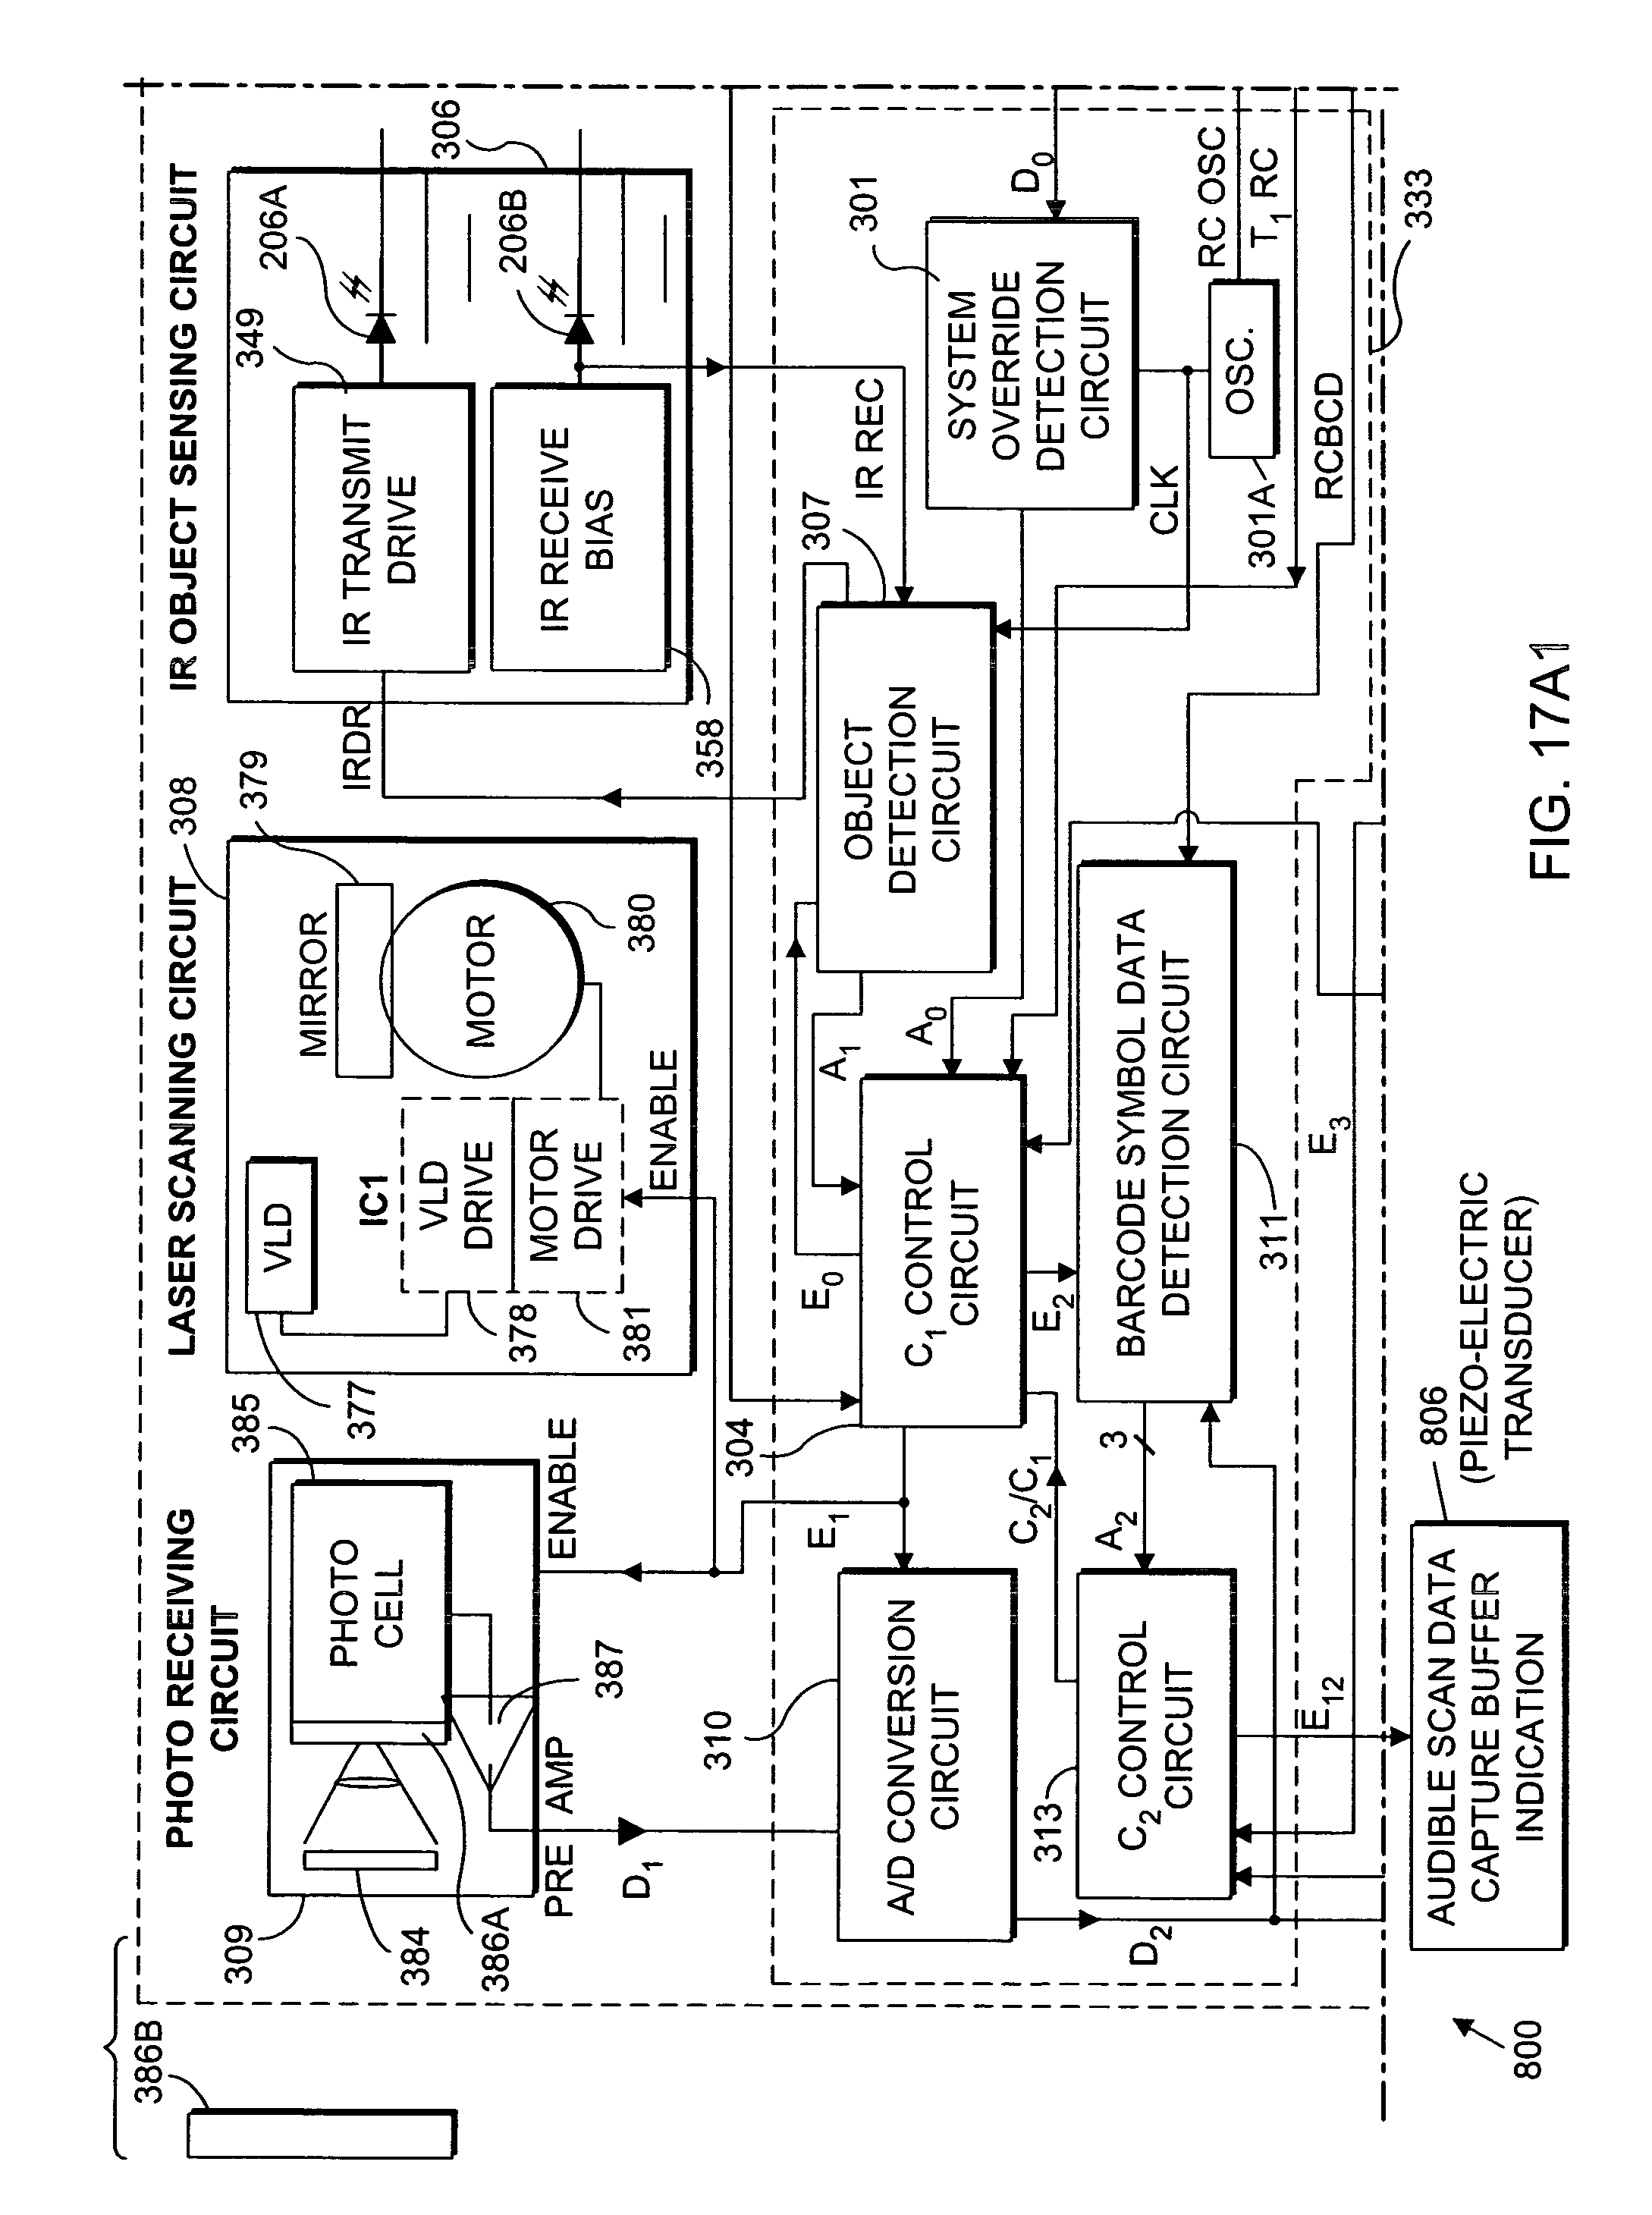 Patent Us 7464878 B2 Leddriven Led Display Circuit Design Powersupplycircuit 0 Petitions